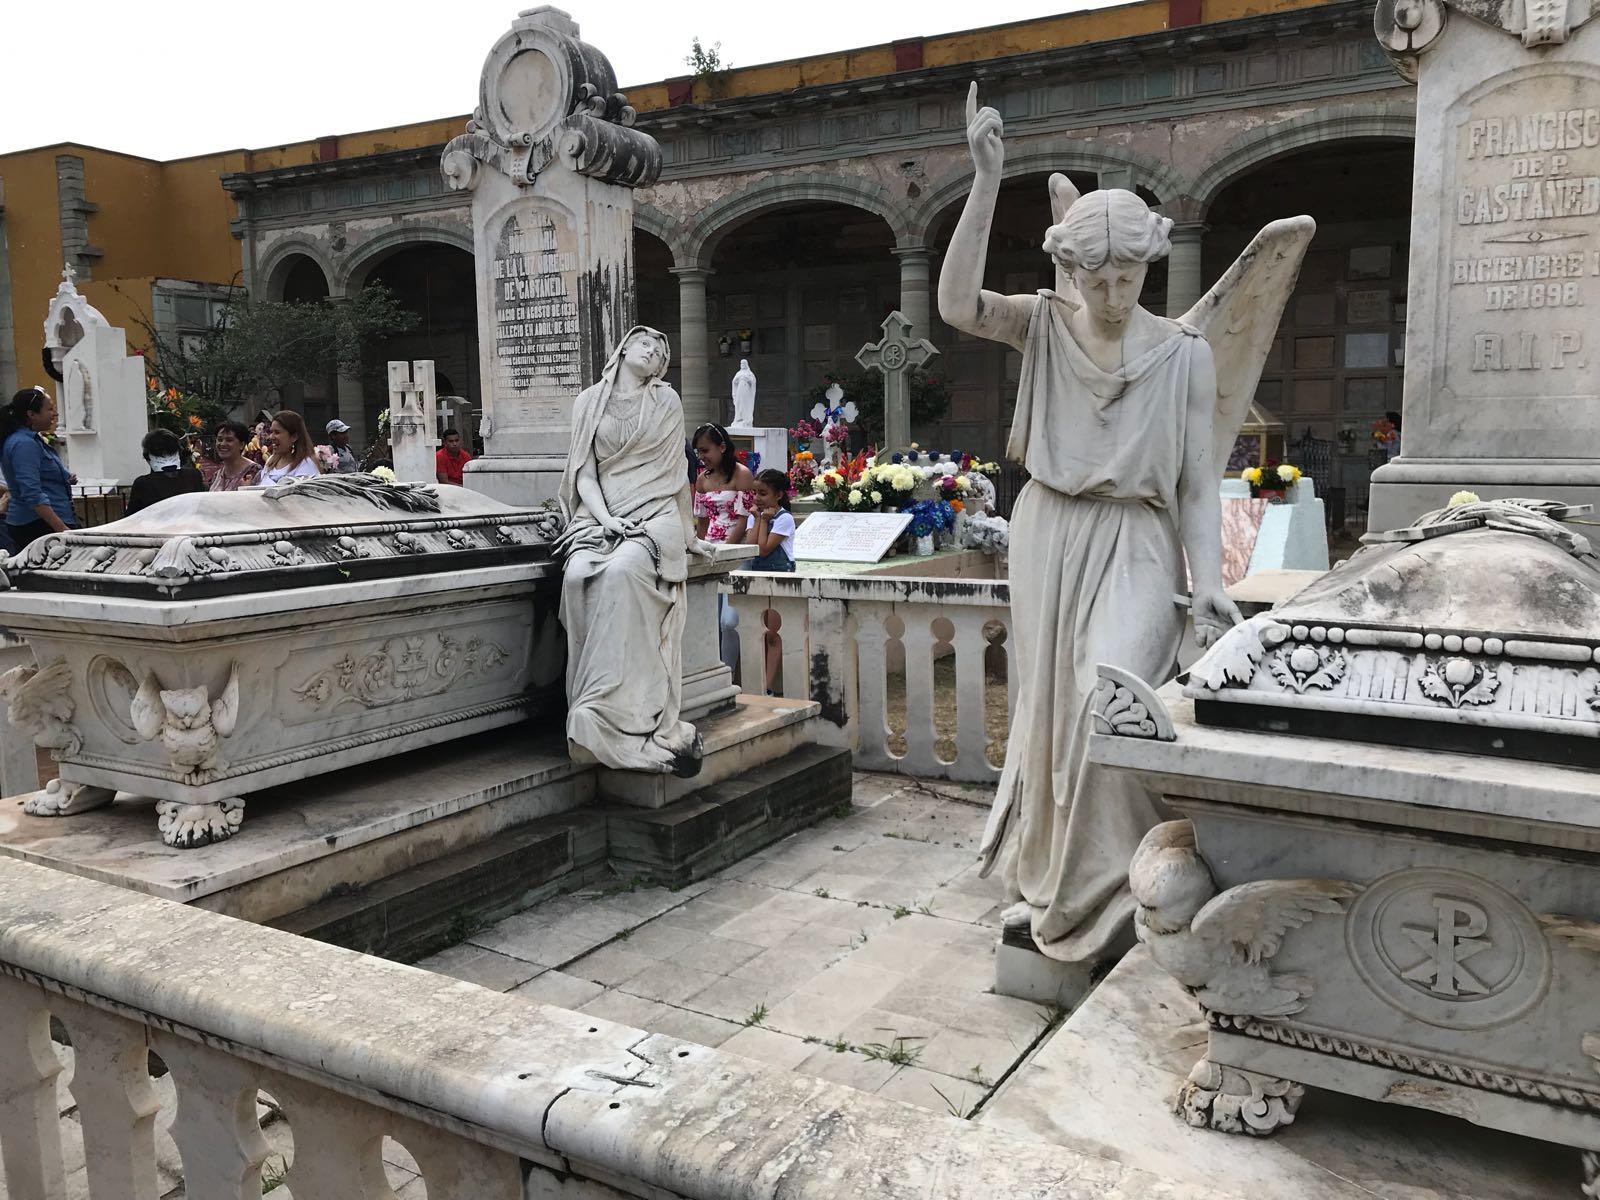 El Panteón de Santa Paula es hoy una reliquia histórica.